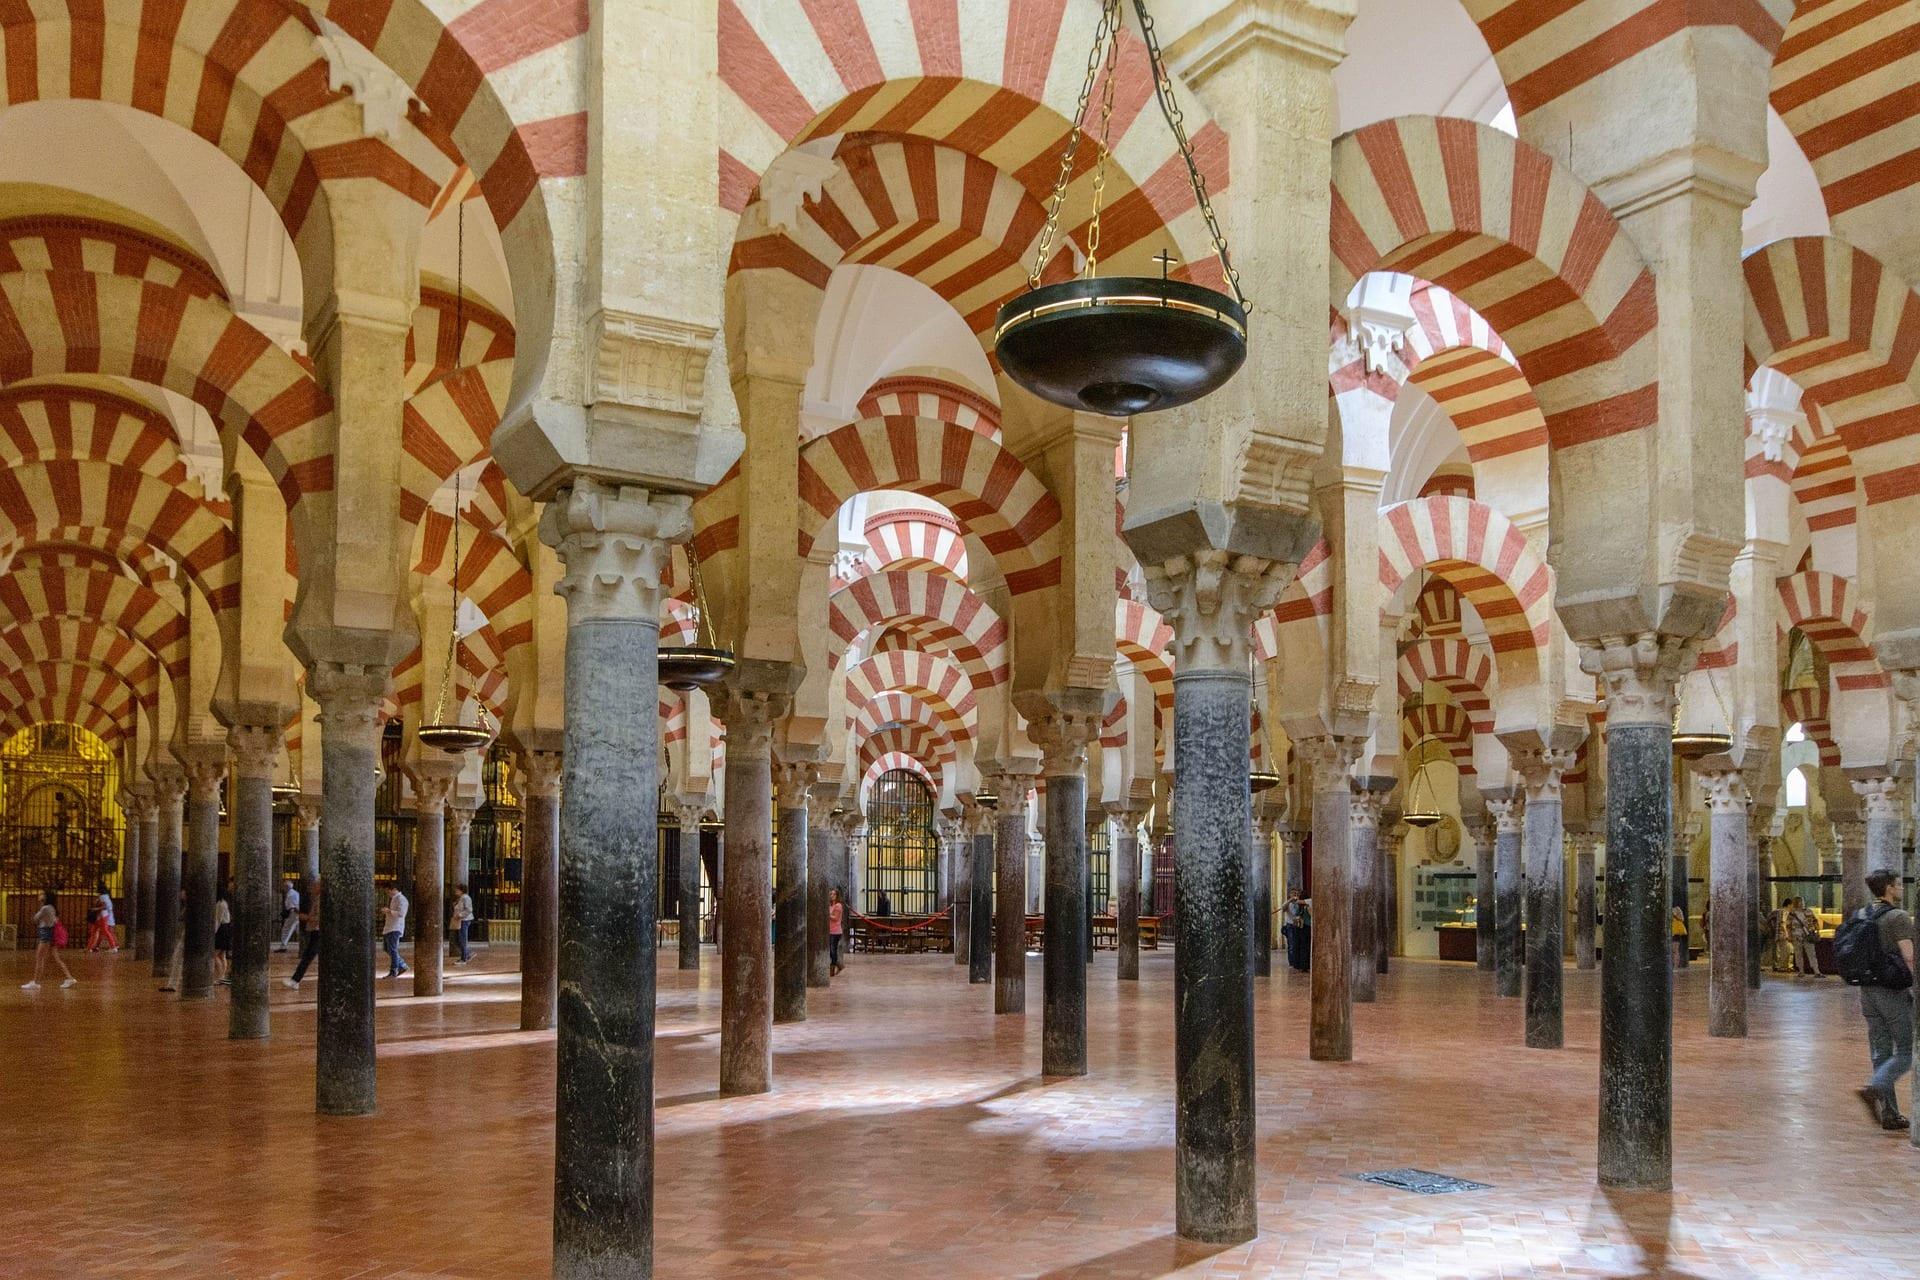 Mezquita de Cordoba Spain